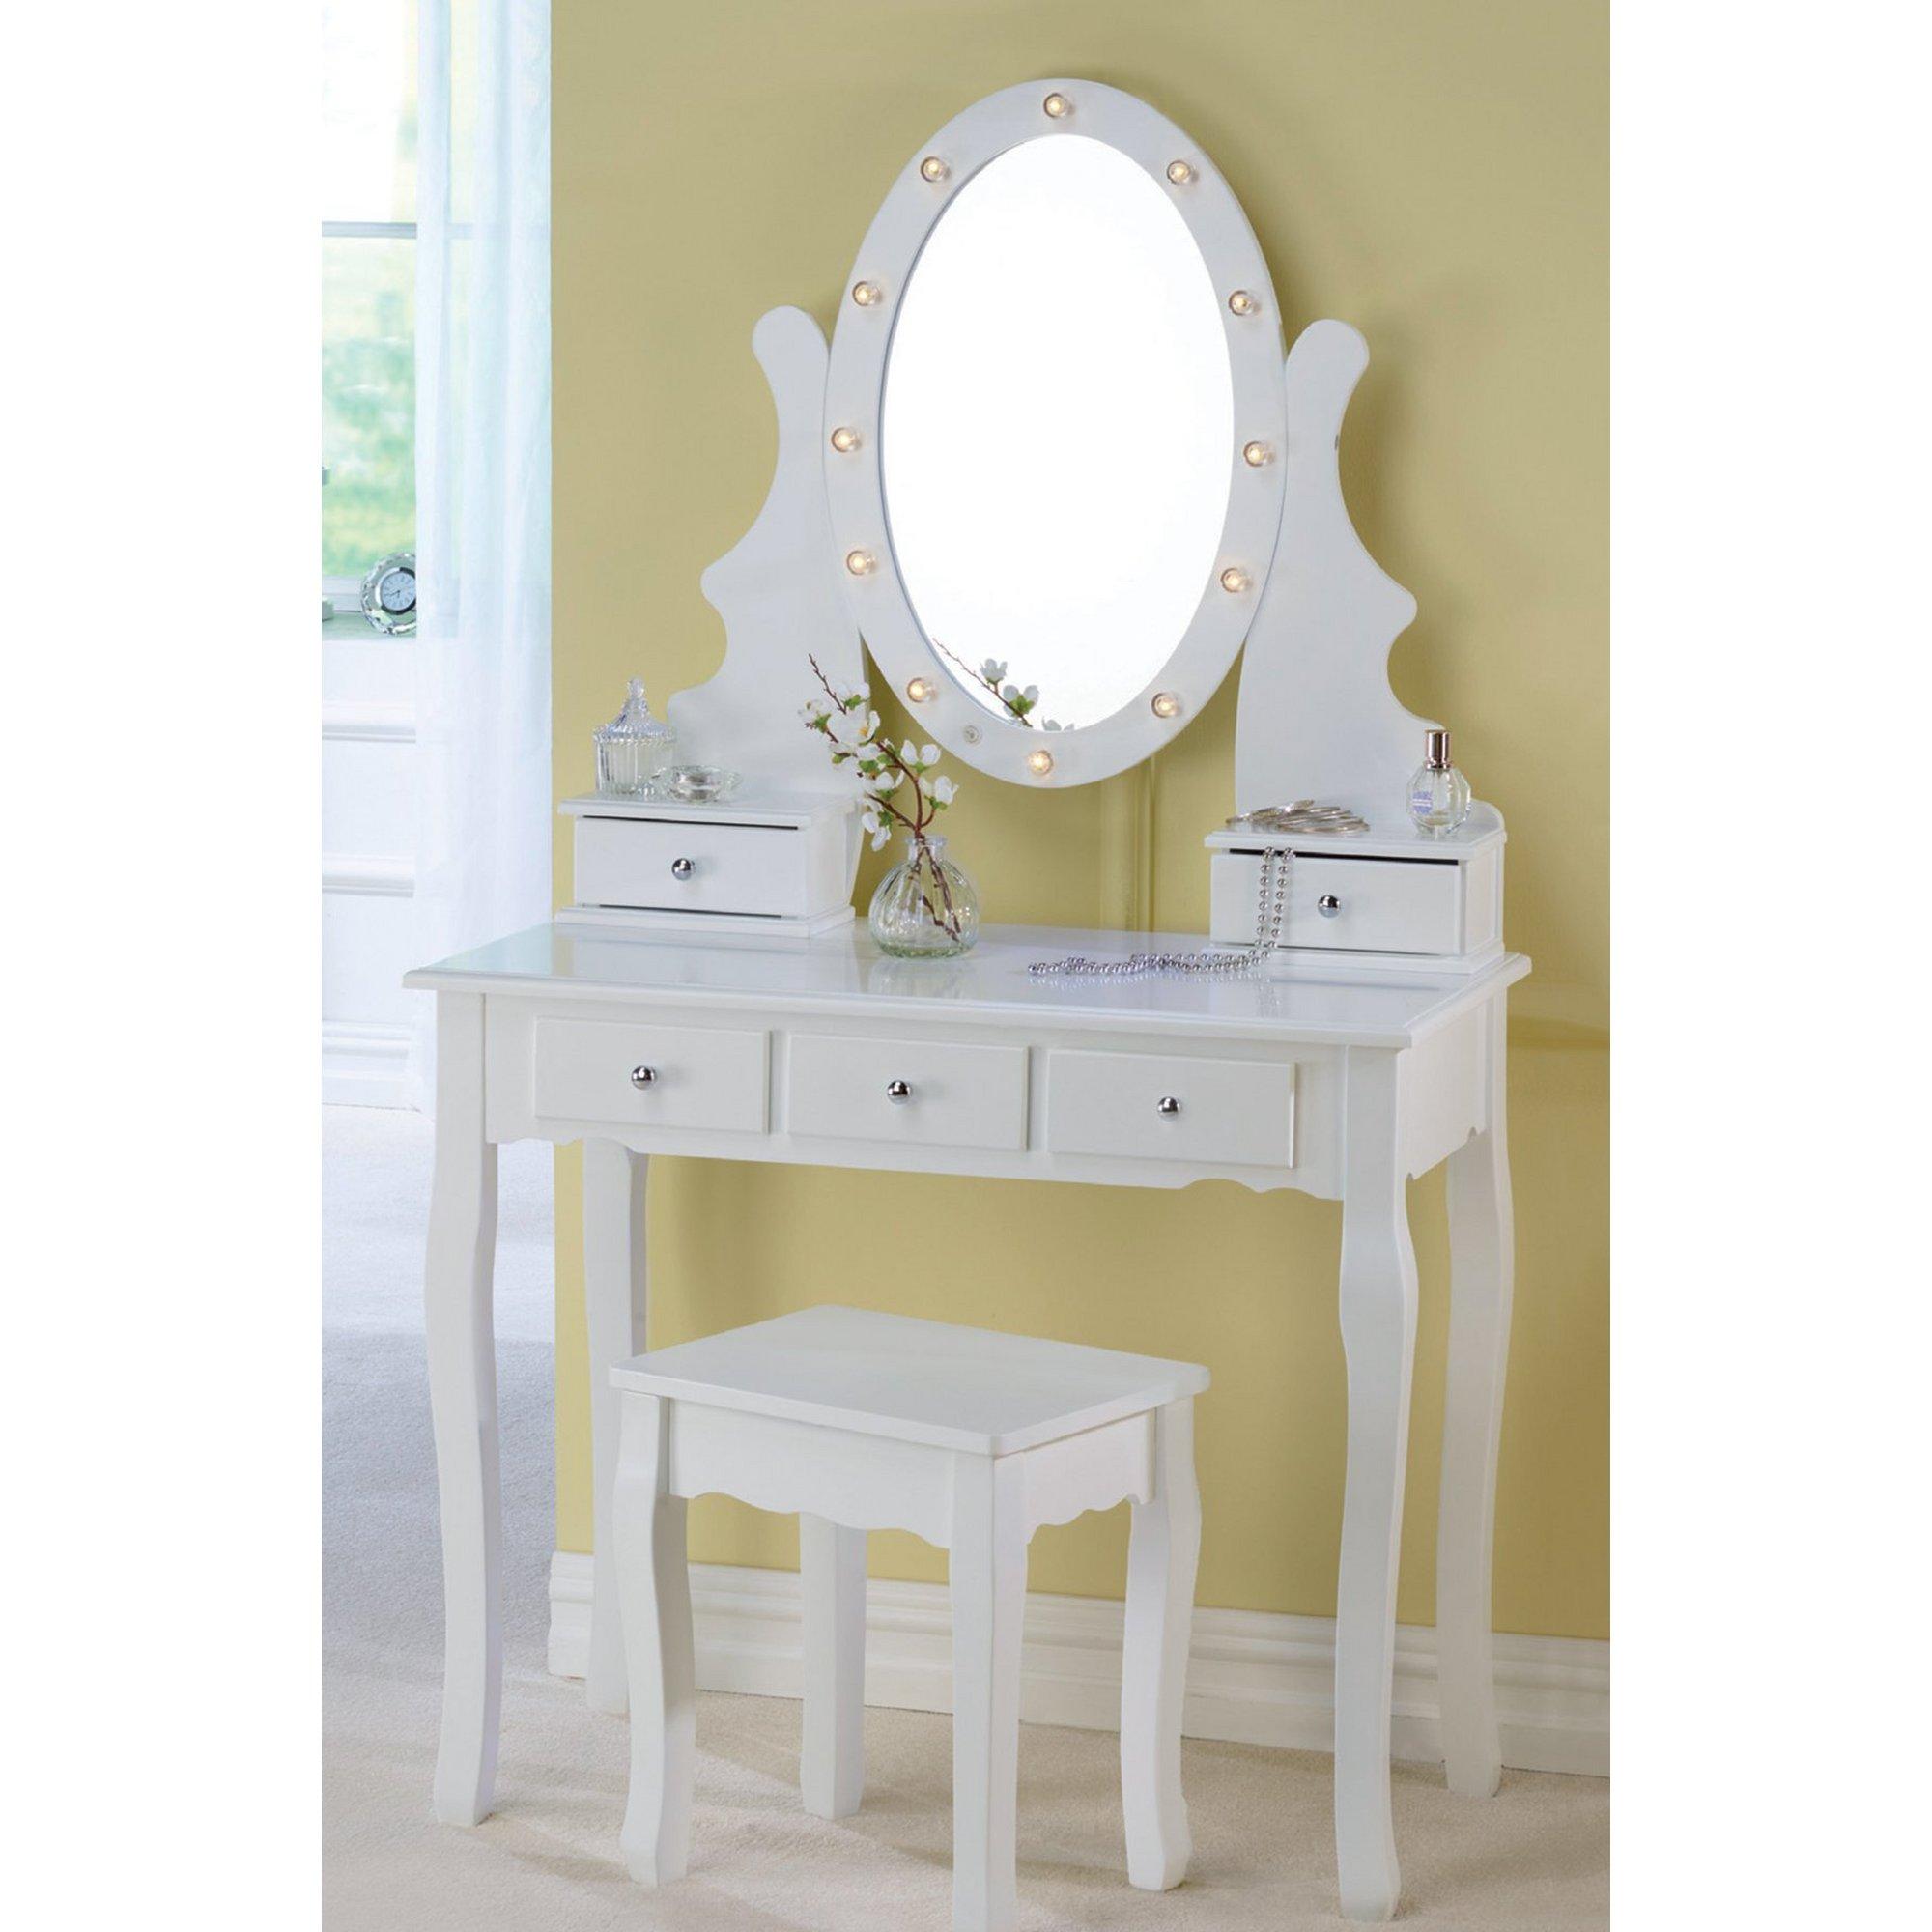 Image of Dressing Table Set with Illuminating Mirror